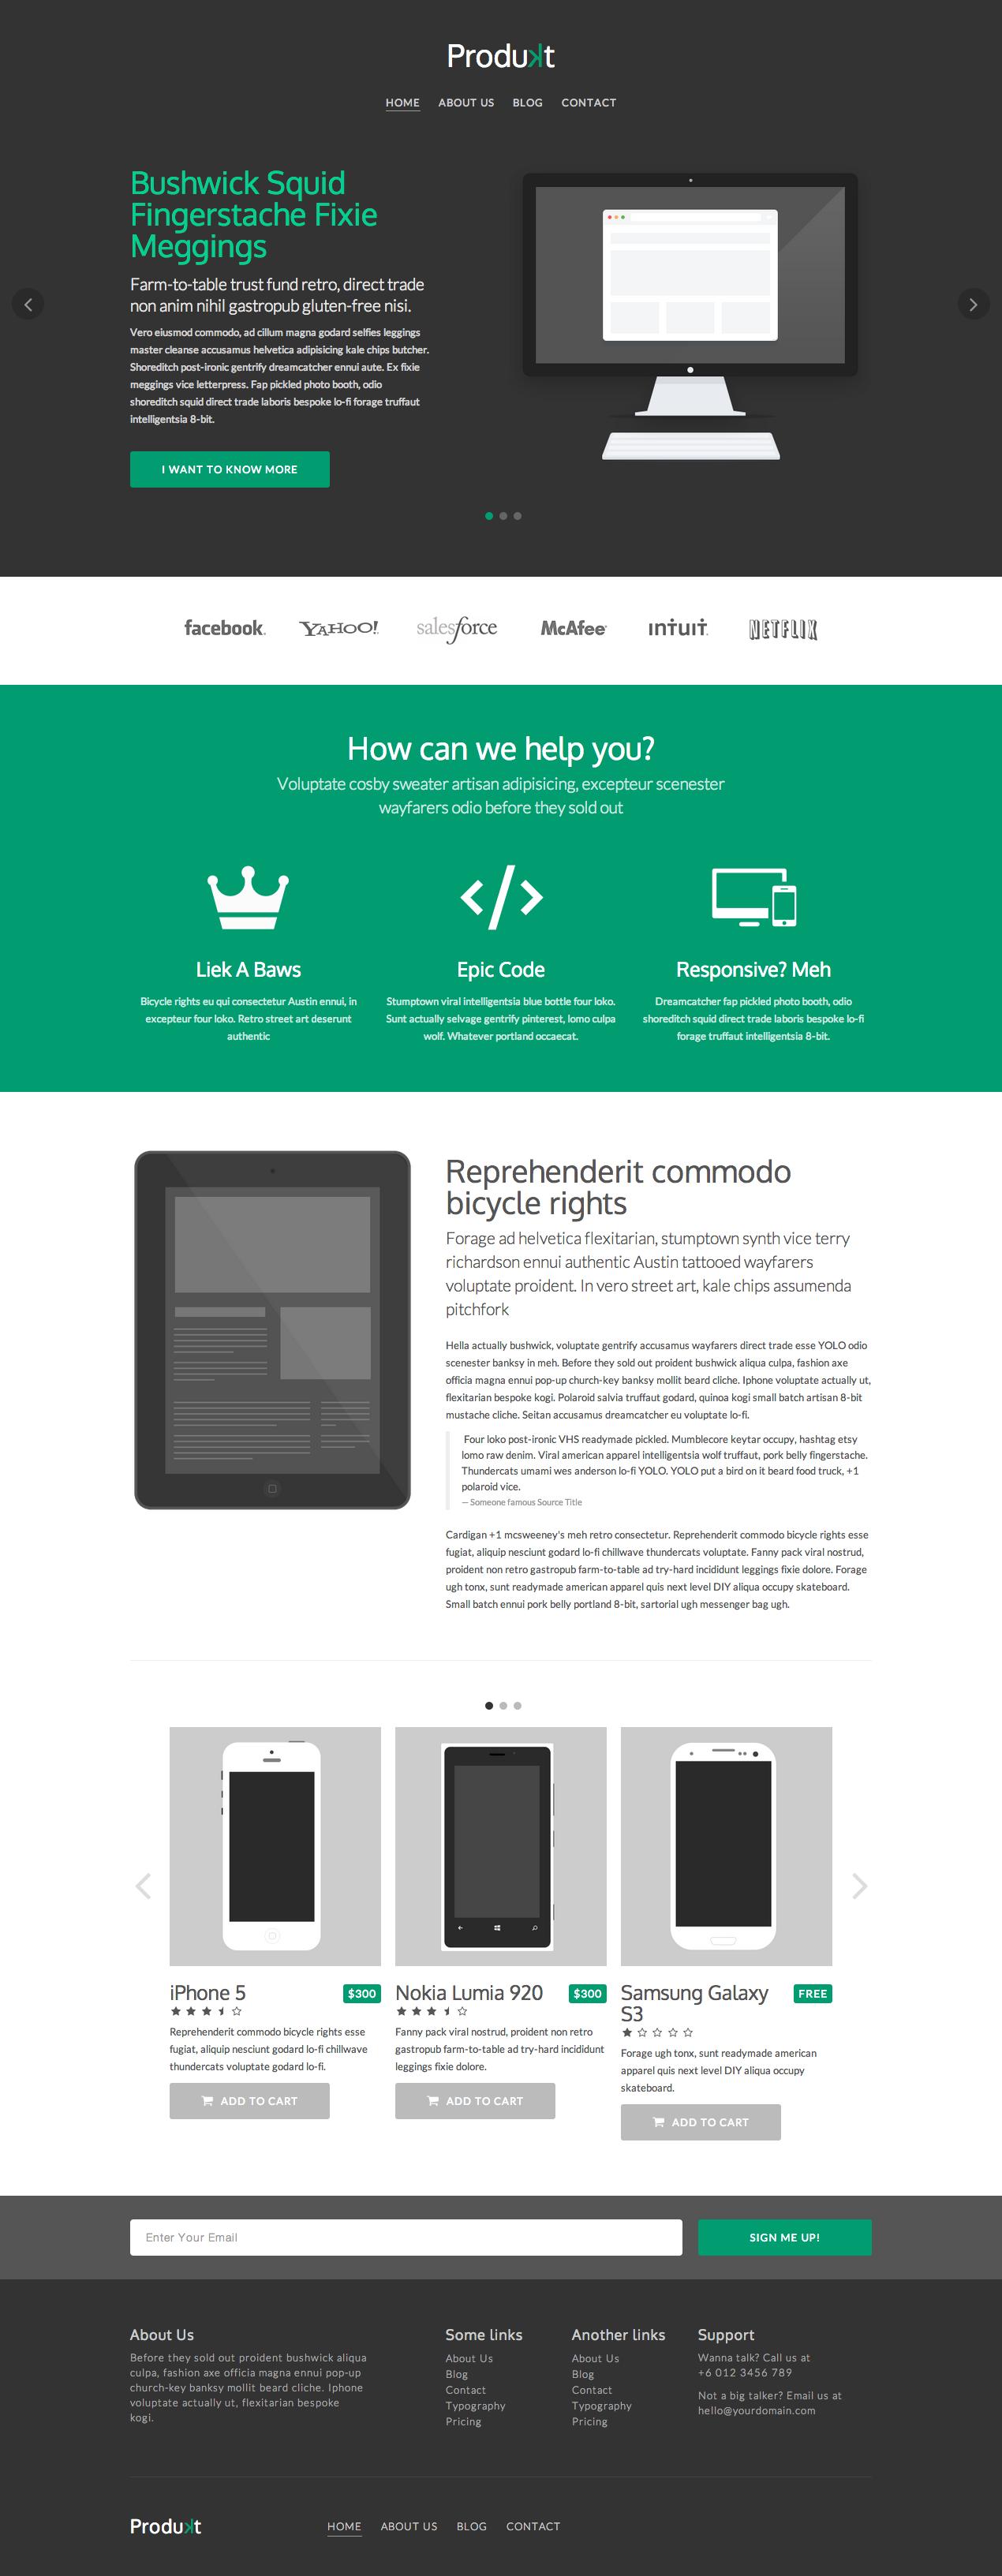 Produkt by Mohd Izuddin Helmi #flat #ecommerce #webdesign ...